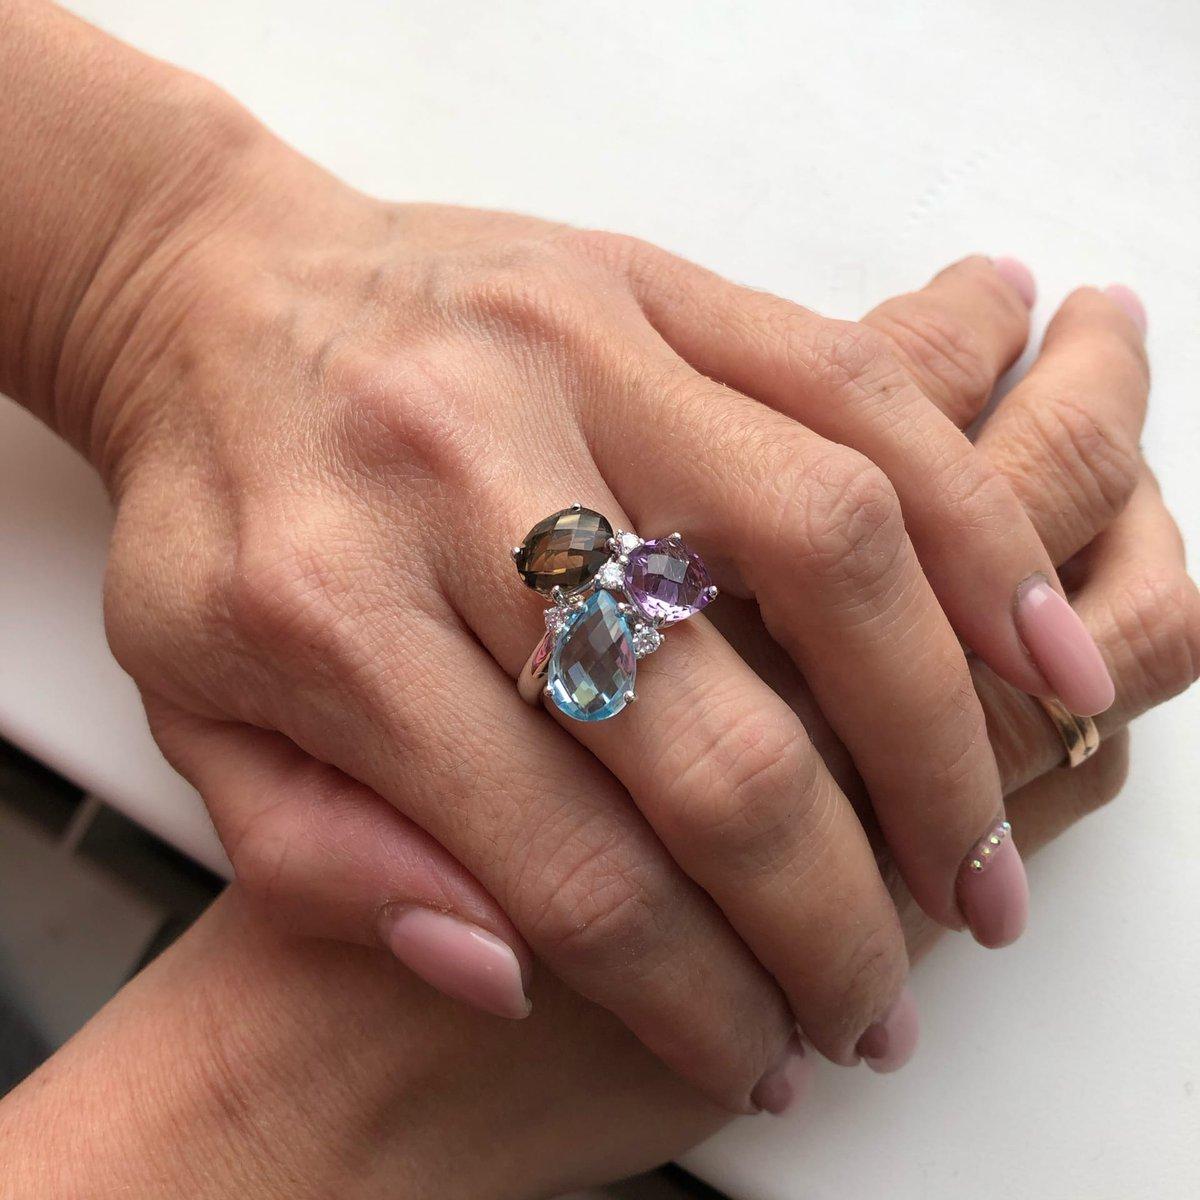 Кольцо серебряное с камнями микс